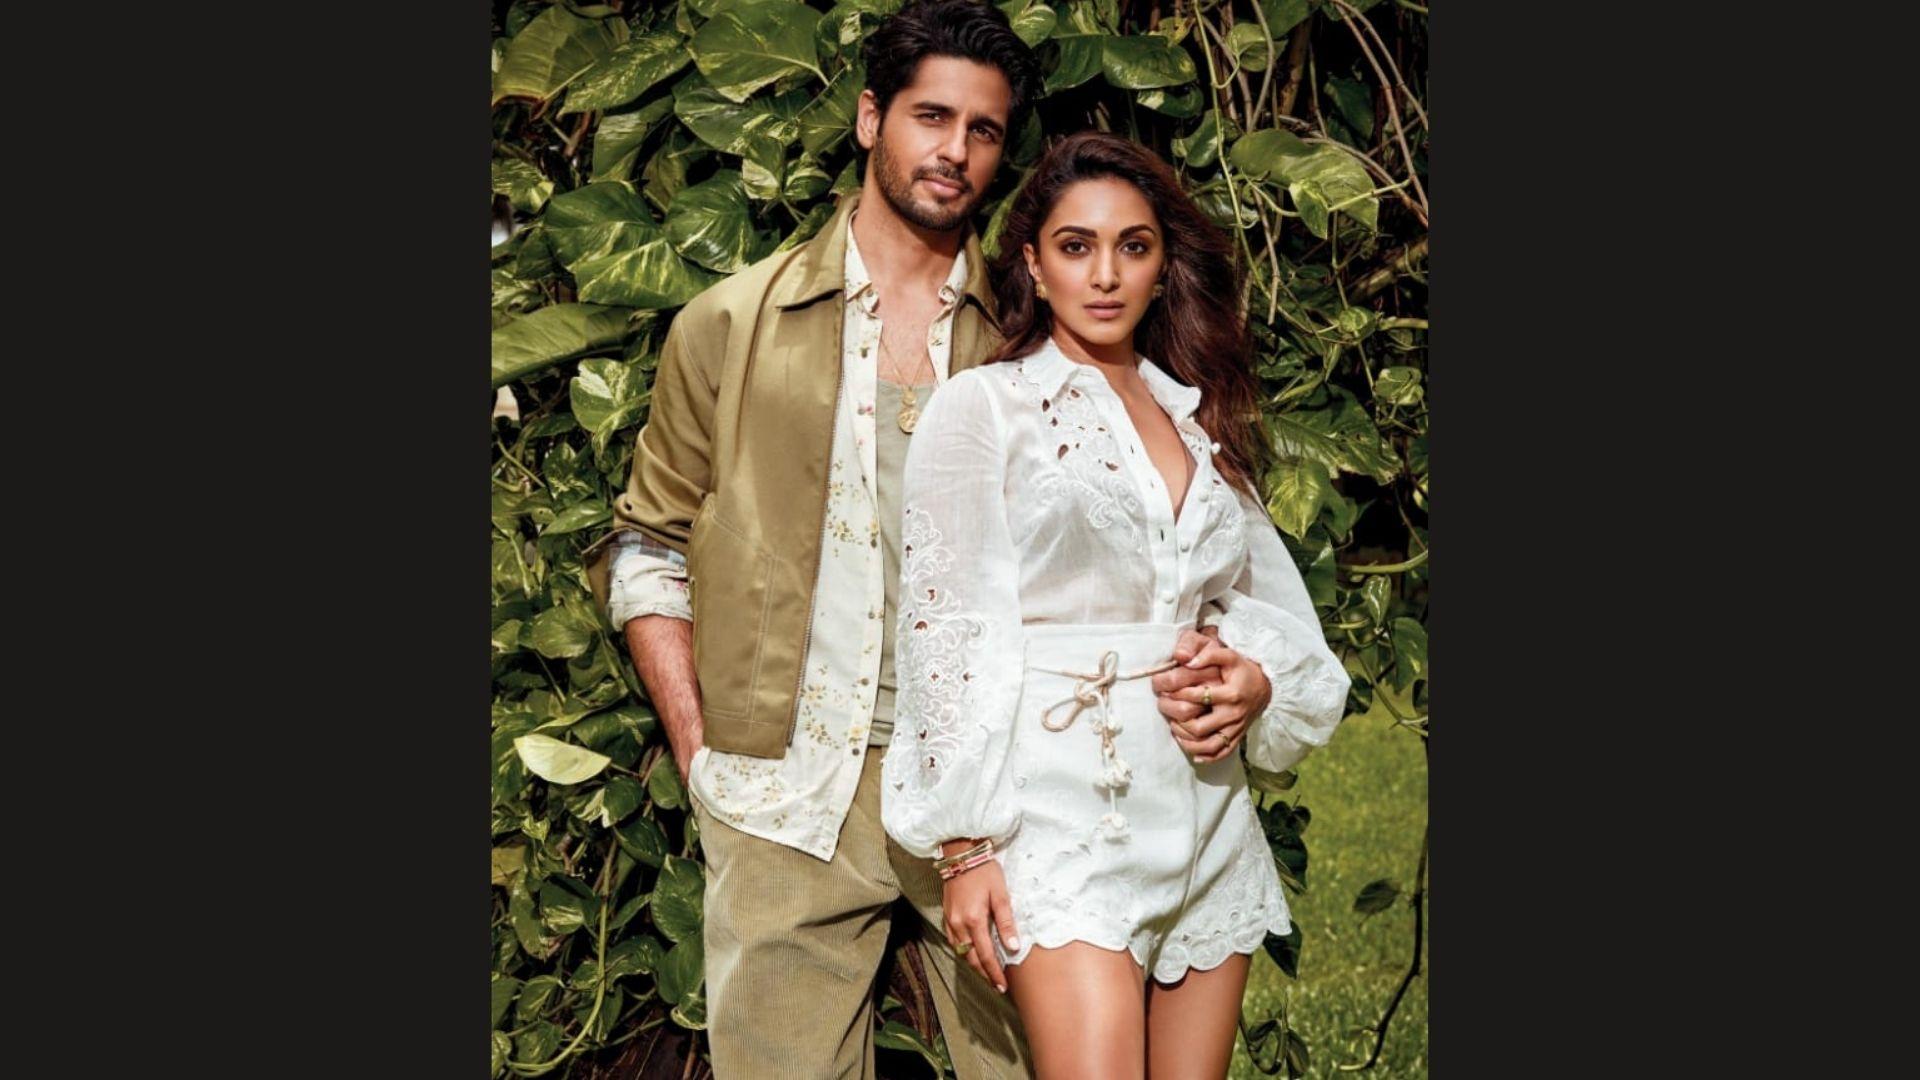 Do You Know How Kiara Advani And Sidharth Malhotra's Love Story Blossomed?